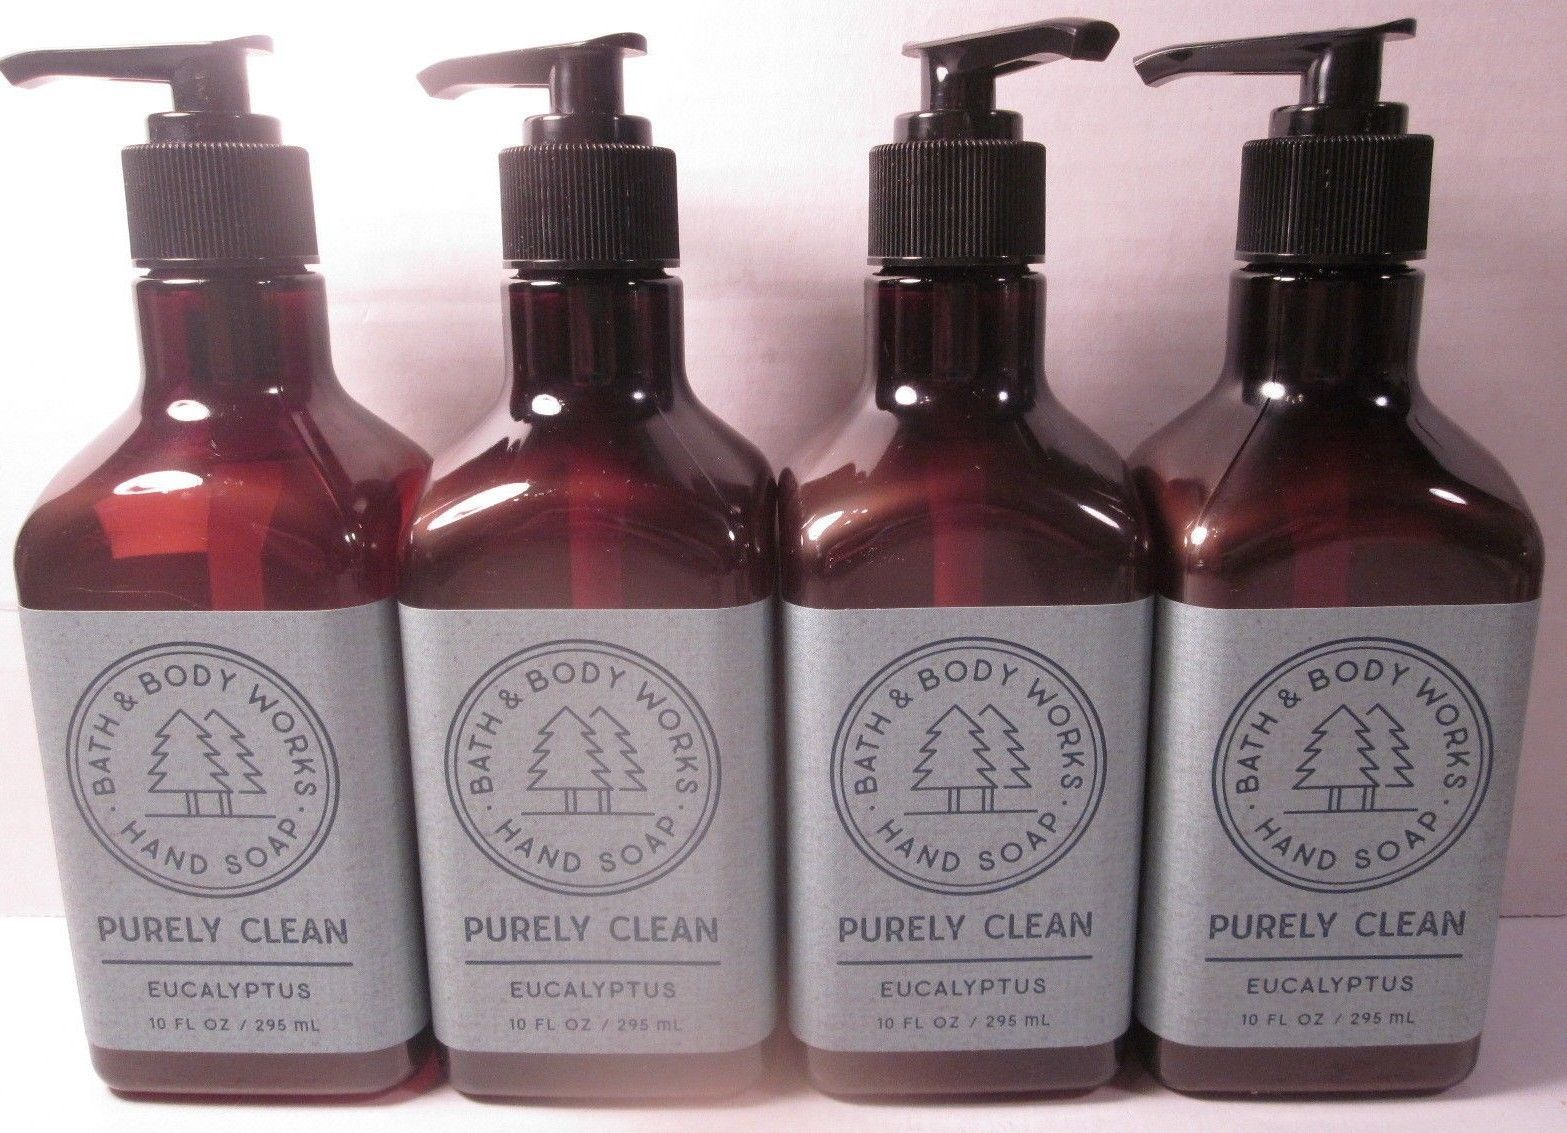 4 Bath & Body Works Purely Clean Hand Soap 10 oz Eucalyptus